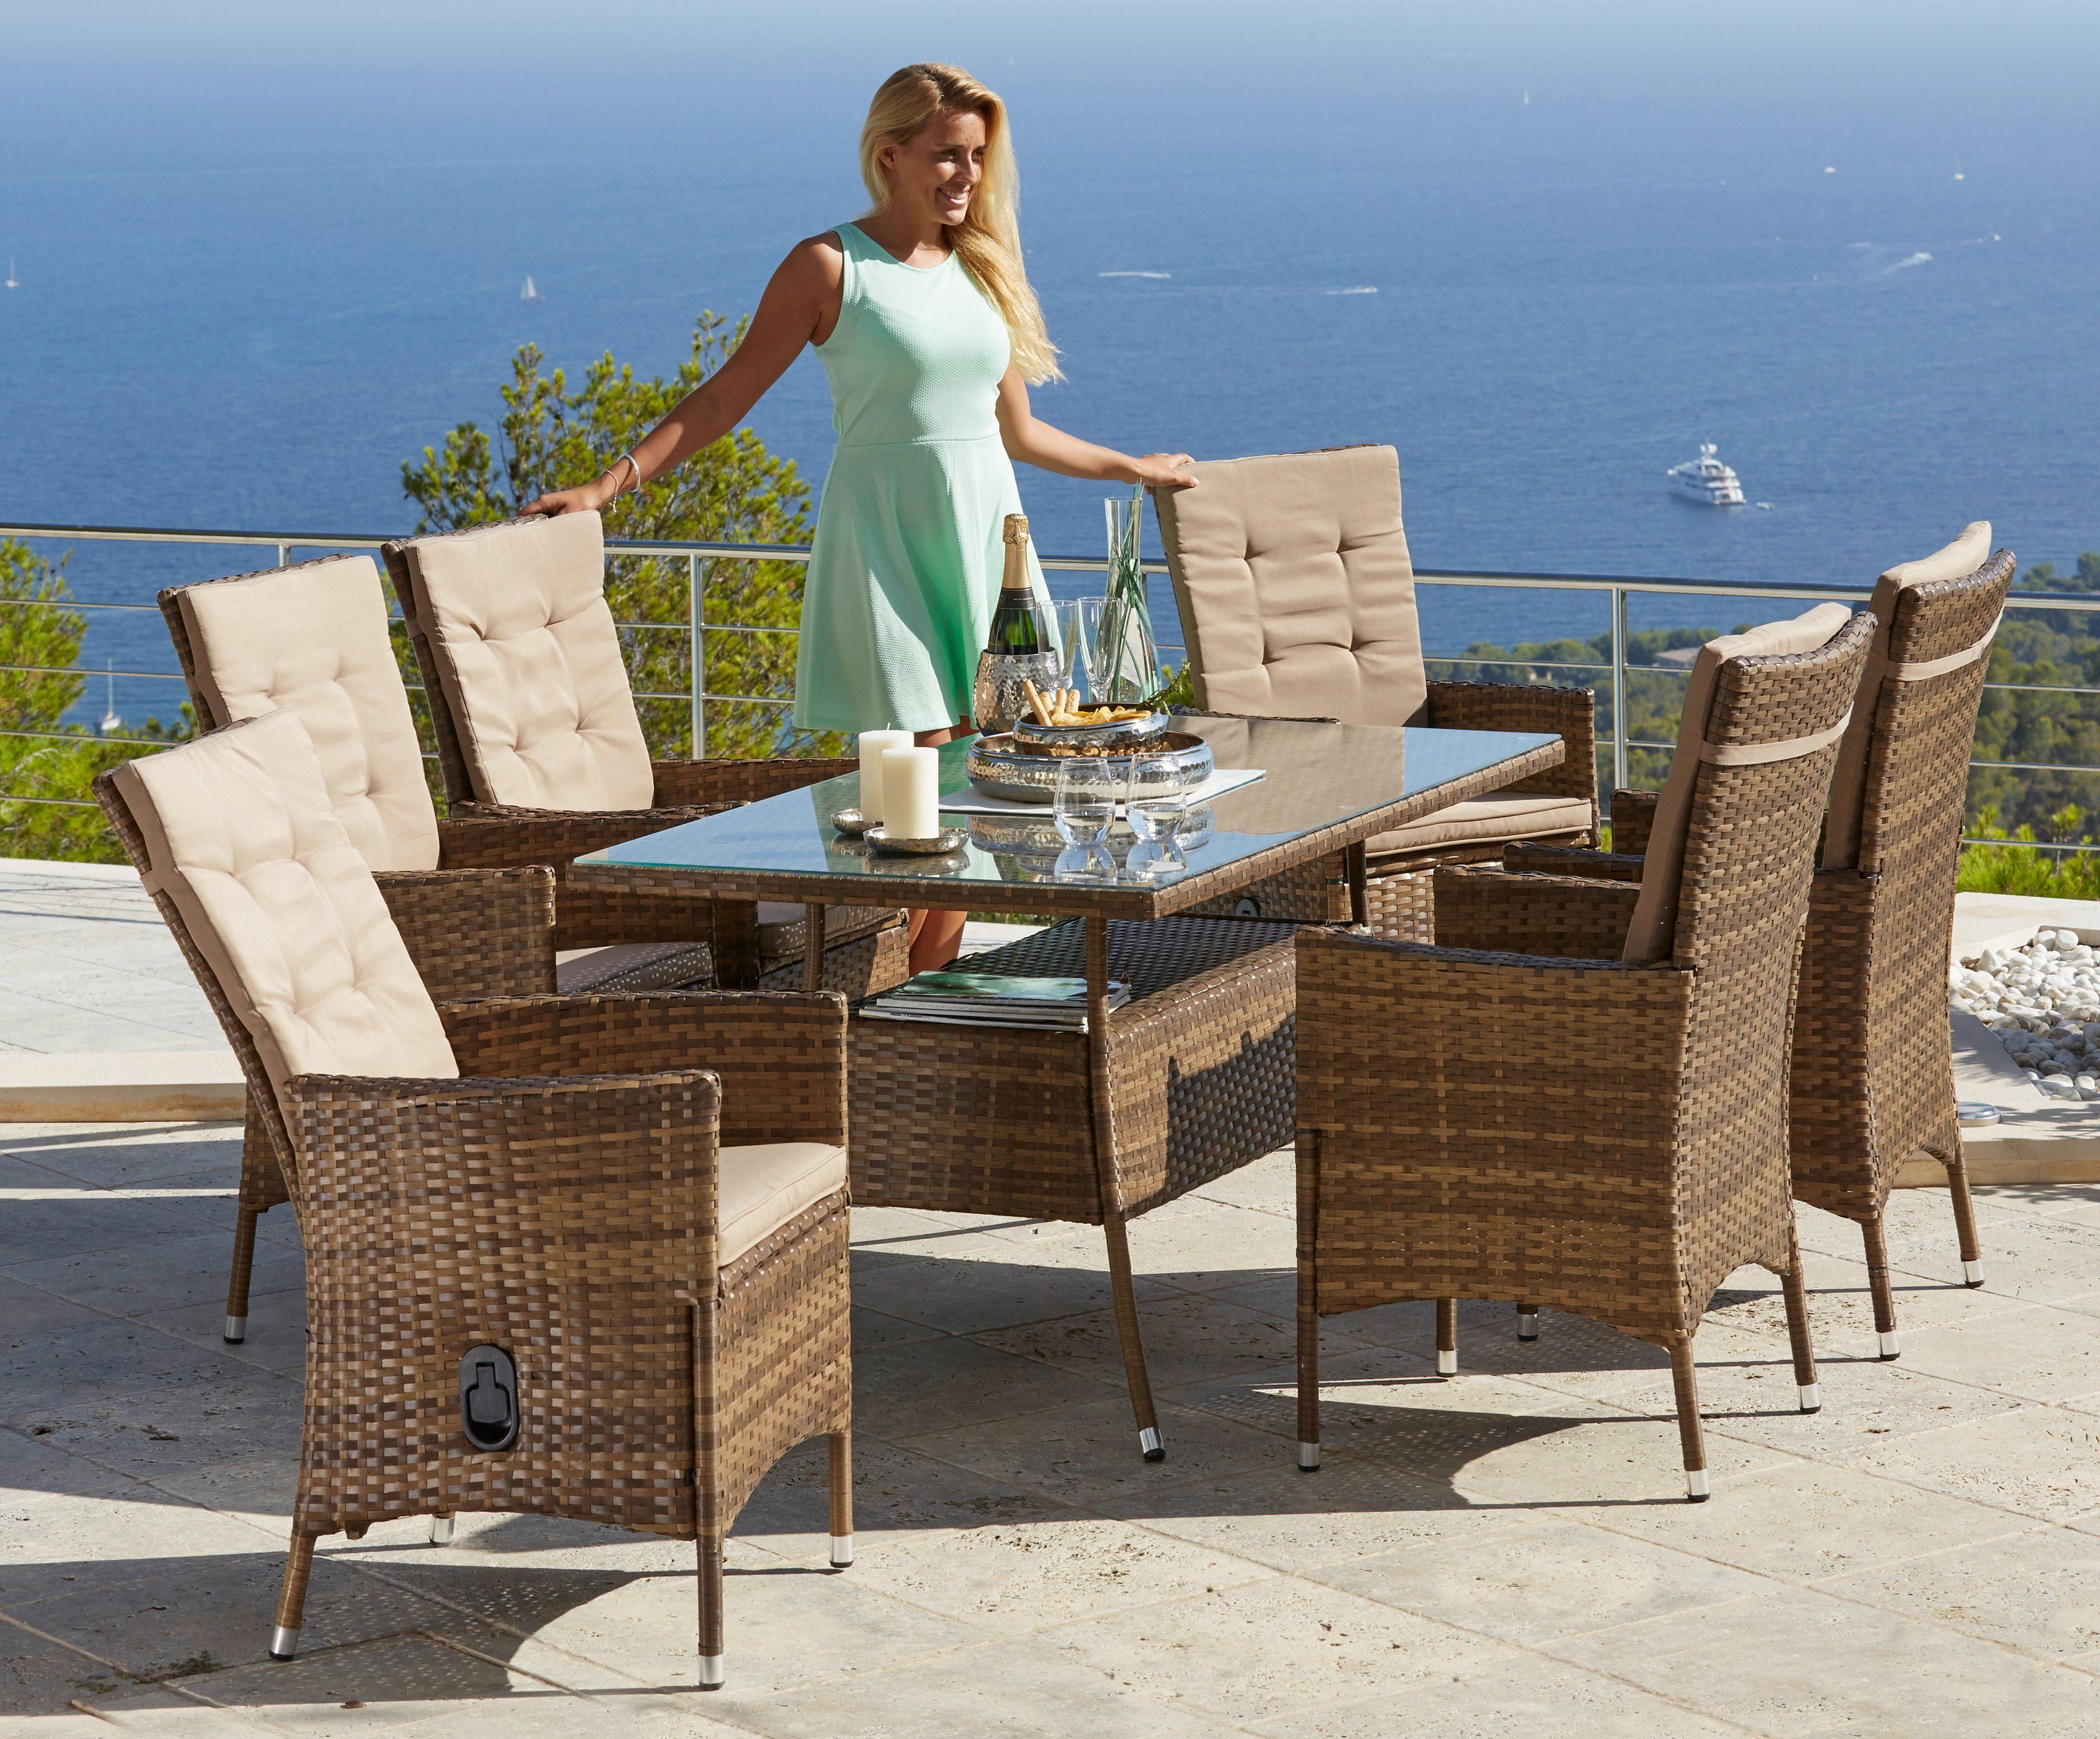 Gartenmöbelset »Santiago Deluxe«, 13-tlg., 6 Sessel, Tisch 80x150 cm, Polyrattan, hellbraun